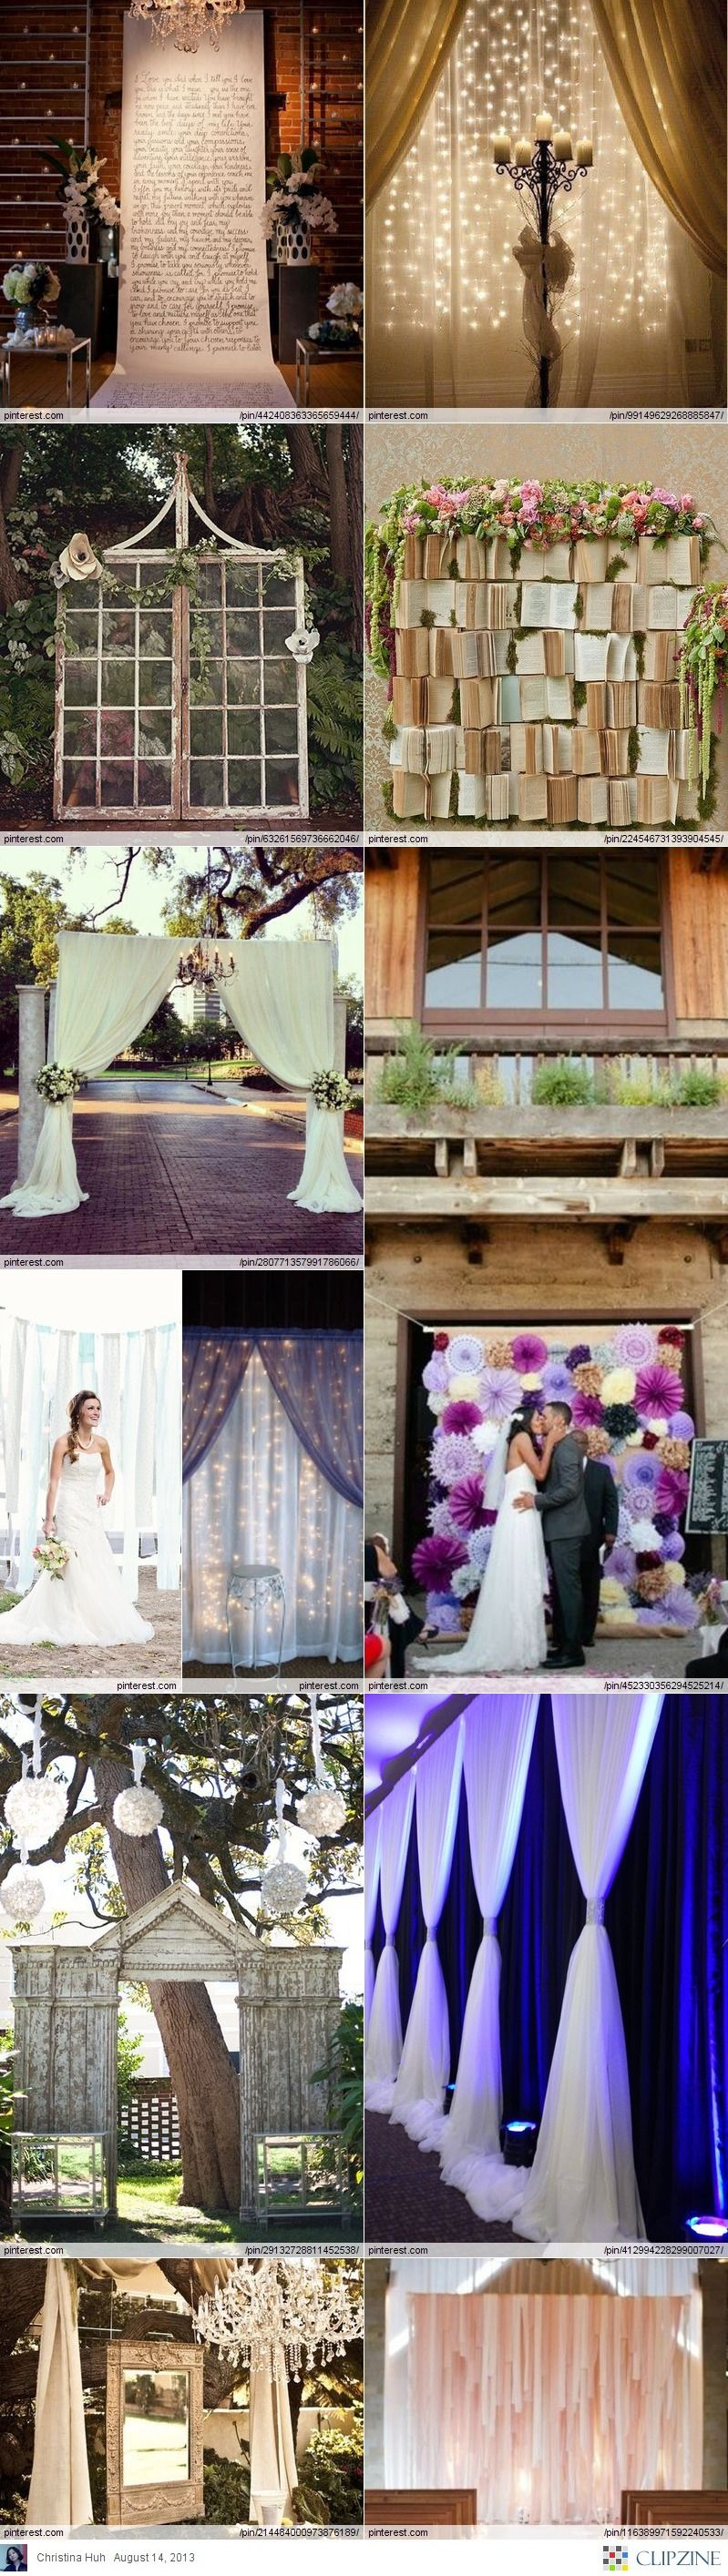 Wedding Backdrop DIY Ideas ***A Book backdrop how sweet is that??? Diy wedding backdrop Diy